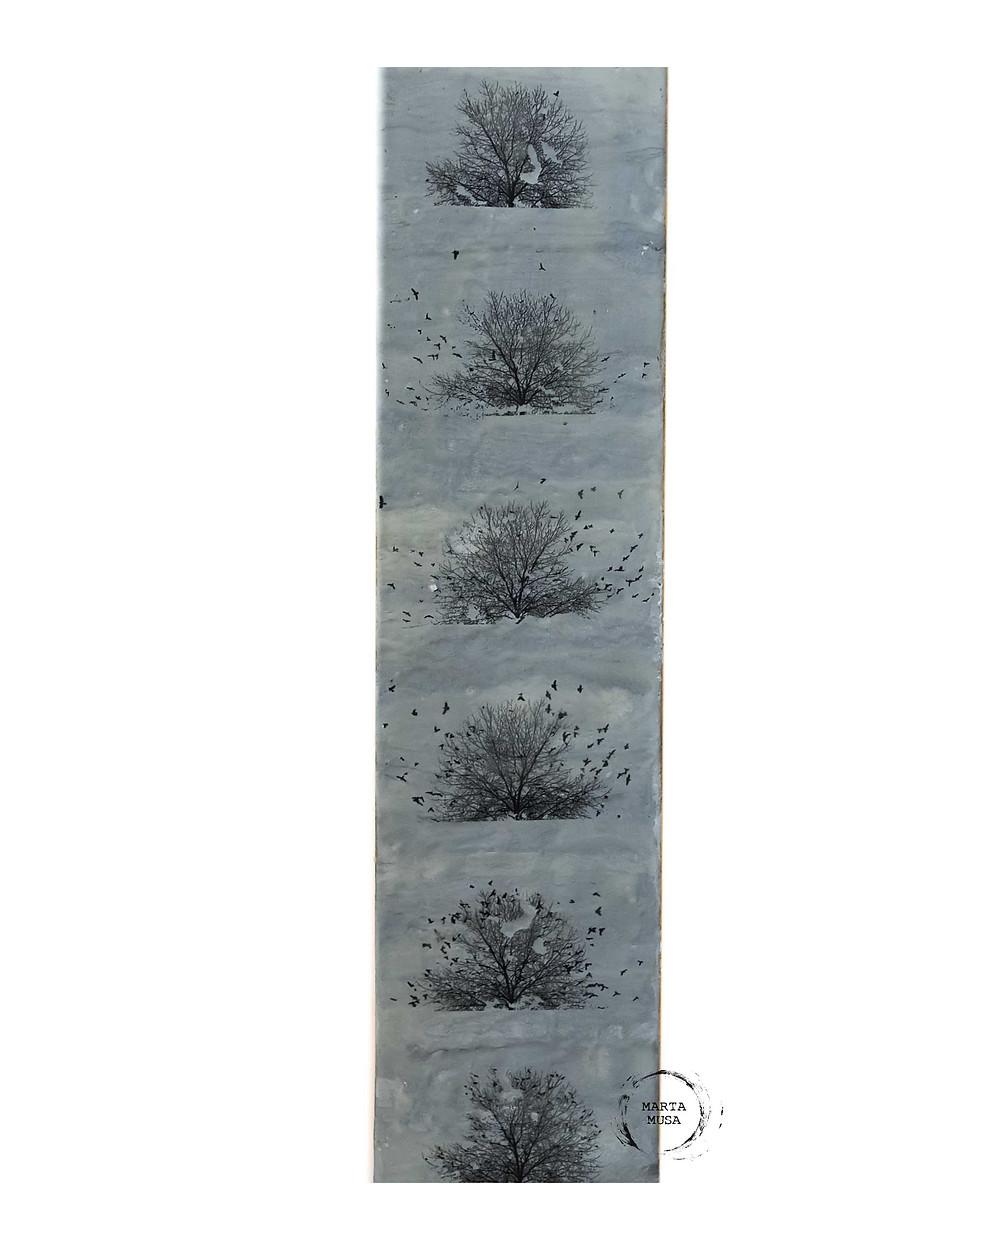 Crows of Still Creek 6 x 24 - $130